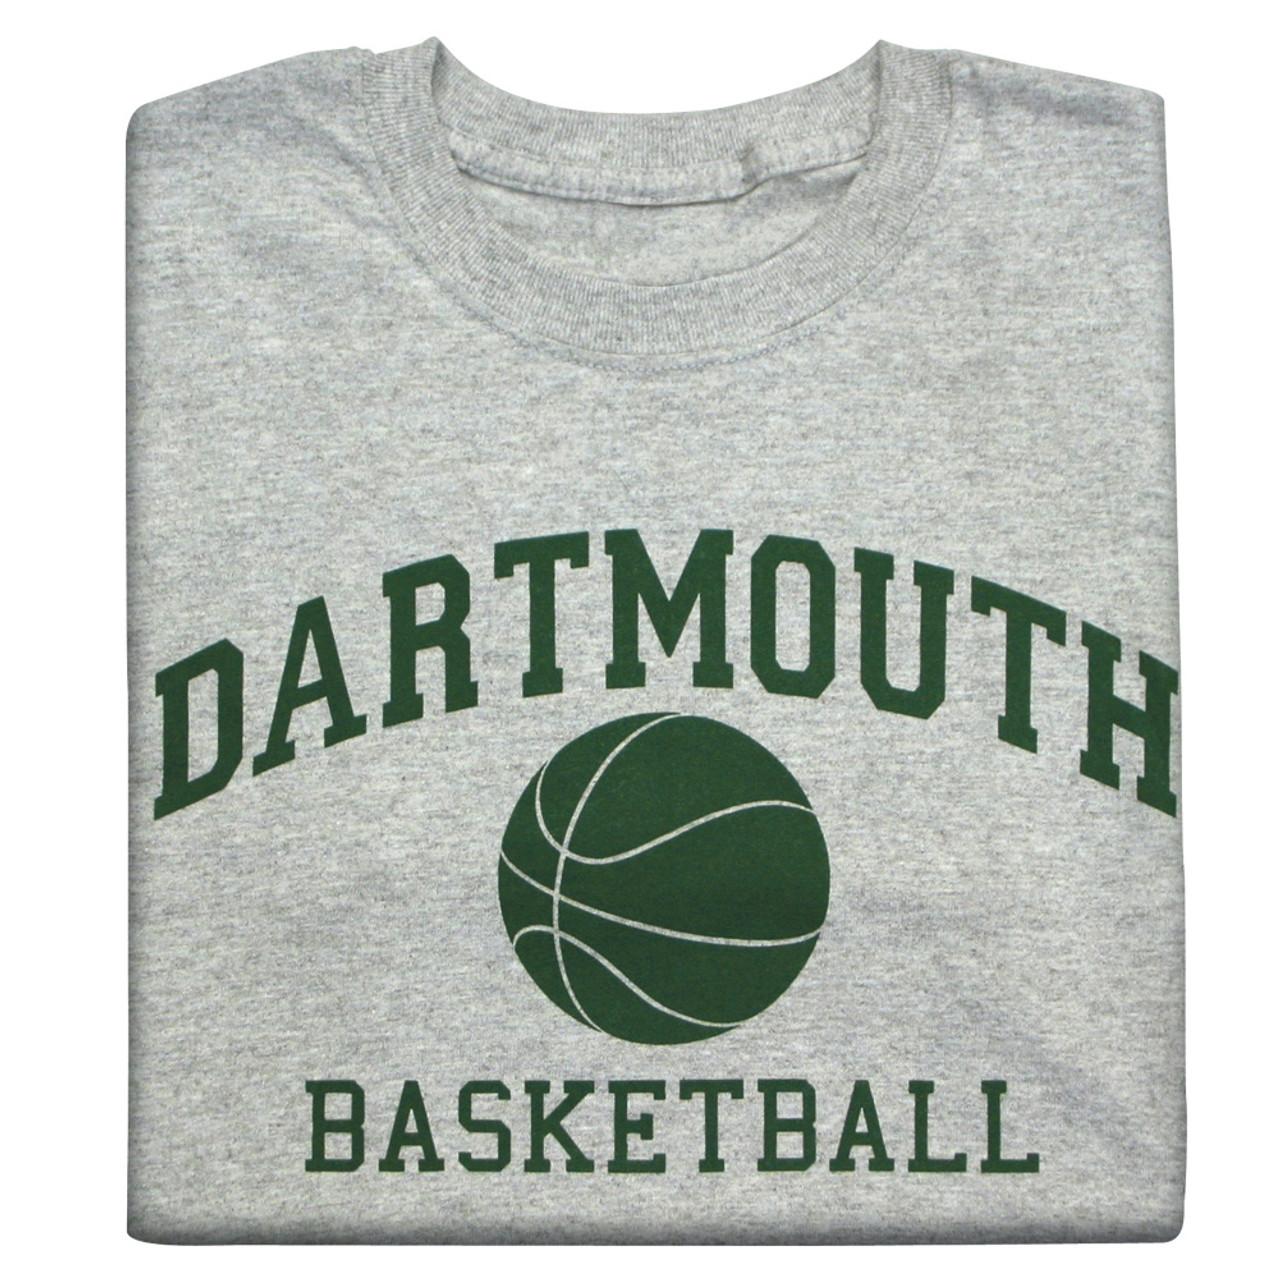 9243235b5b1 College Basketball Tee Shirts   Top Mode Depot